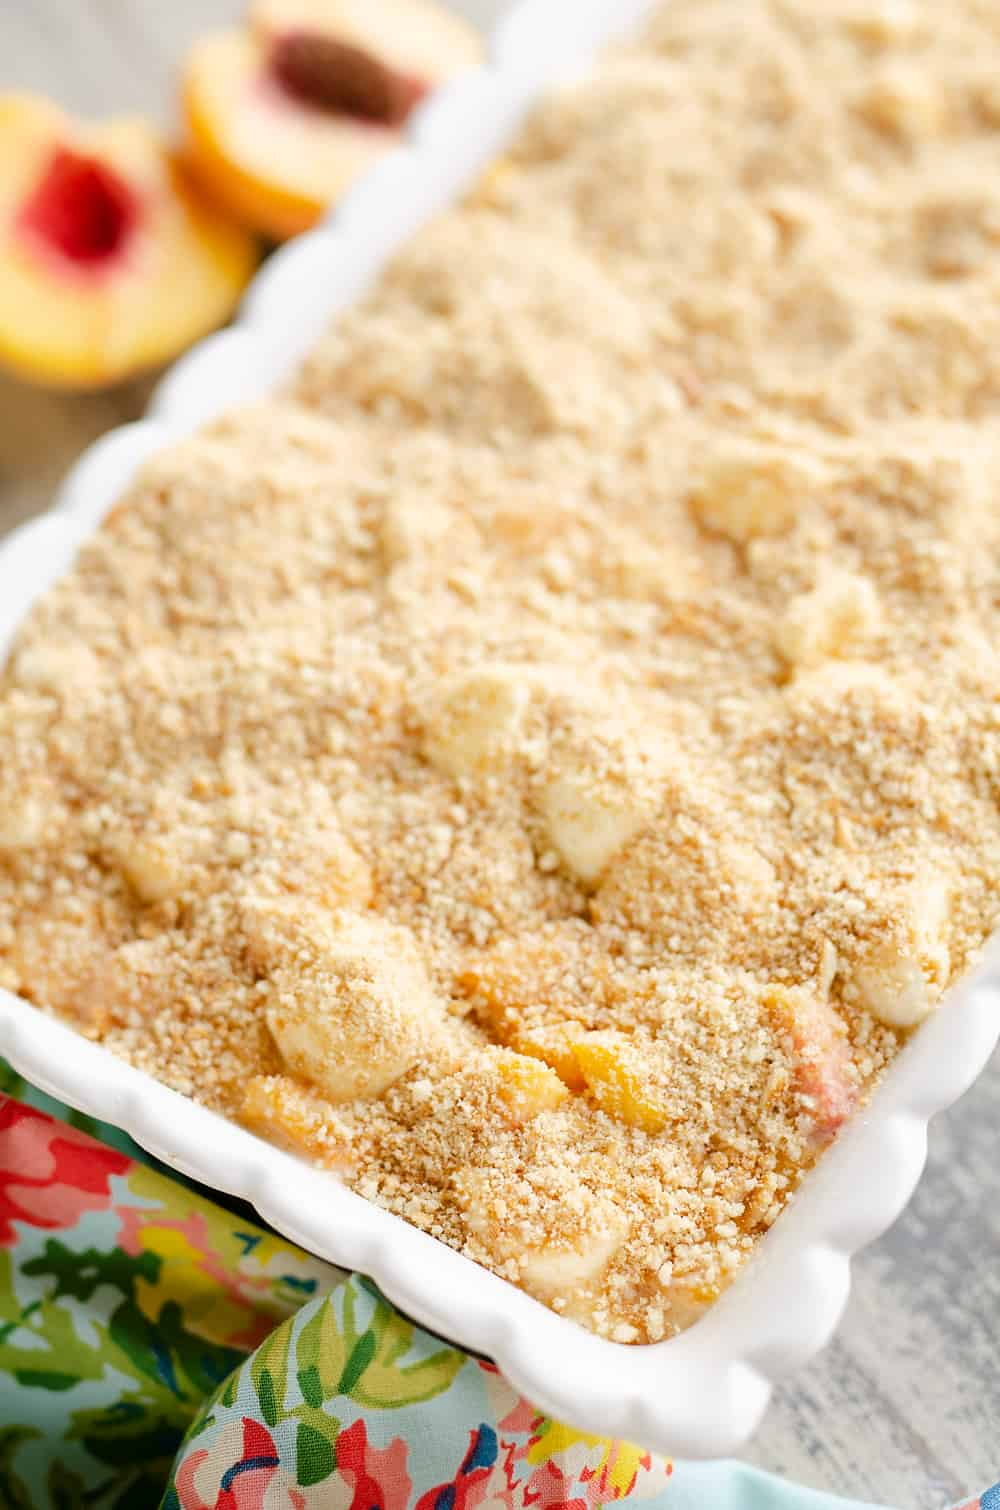 Marshmallow Peach Icebox Dessert in serving pan